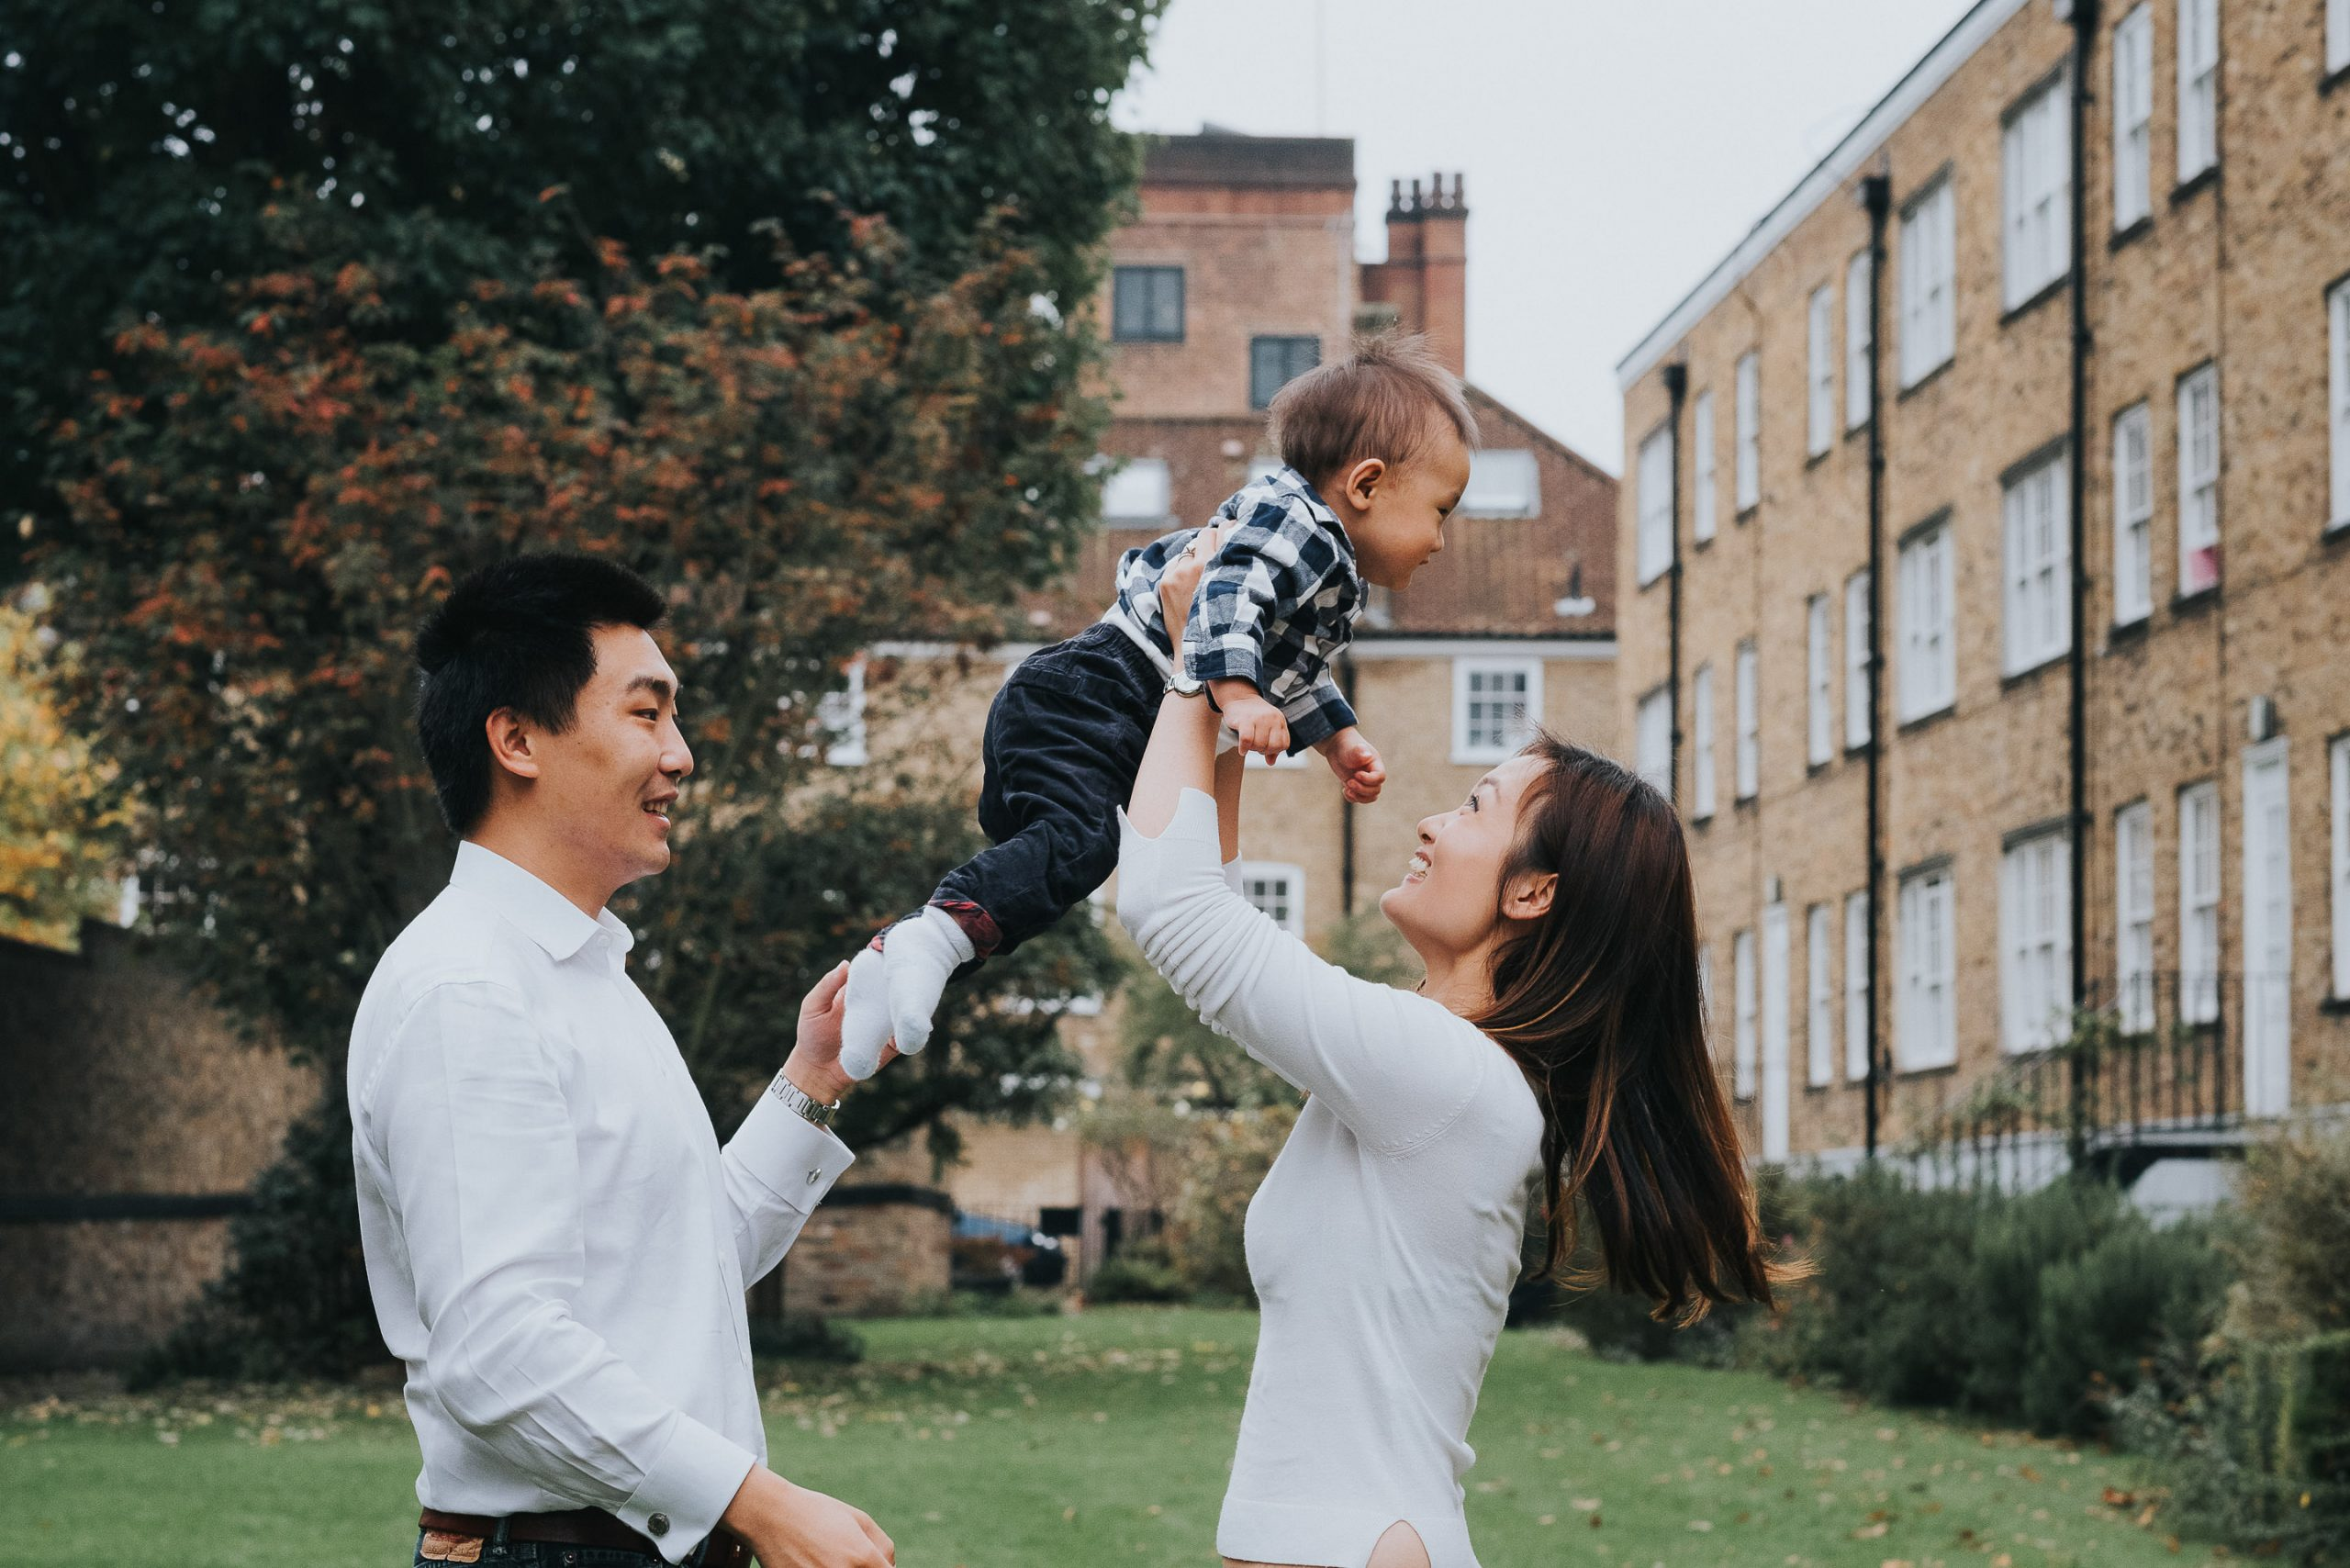 LONDON FAMILY PHOTOGRAPHER - 10